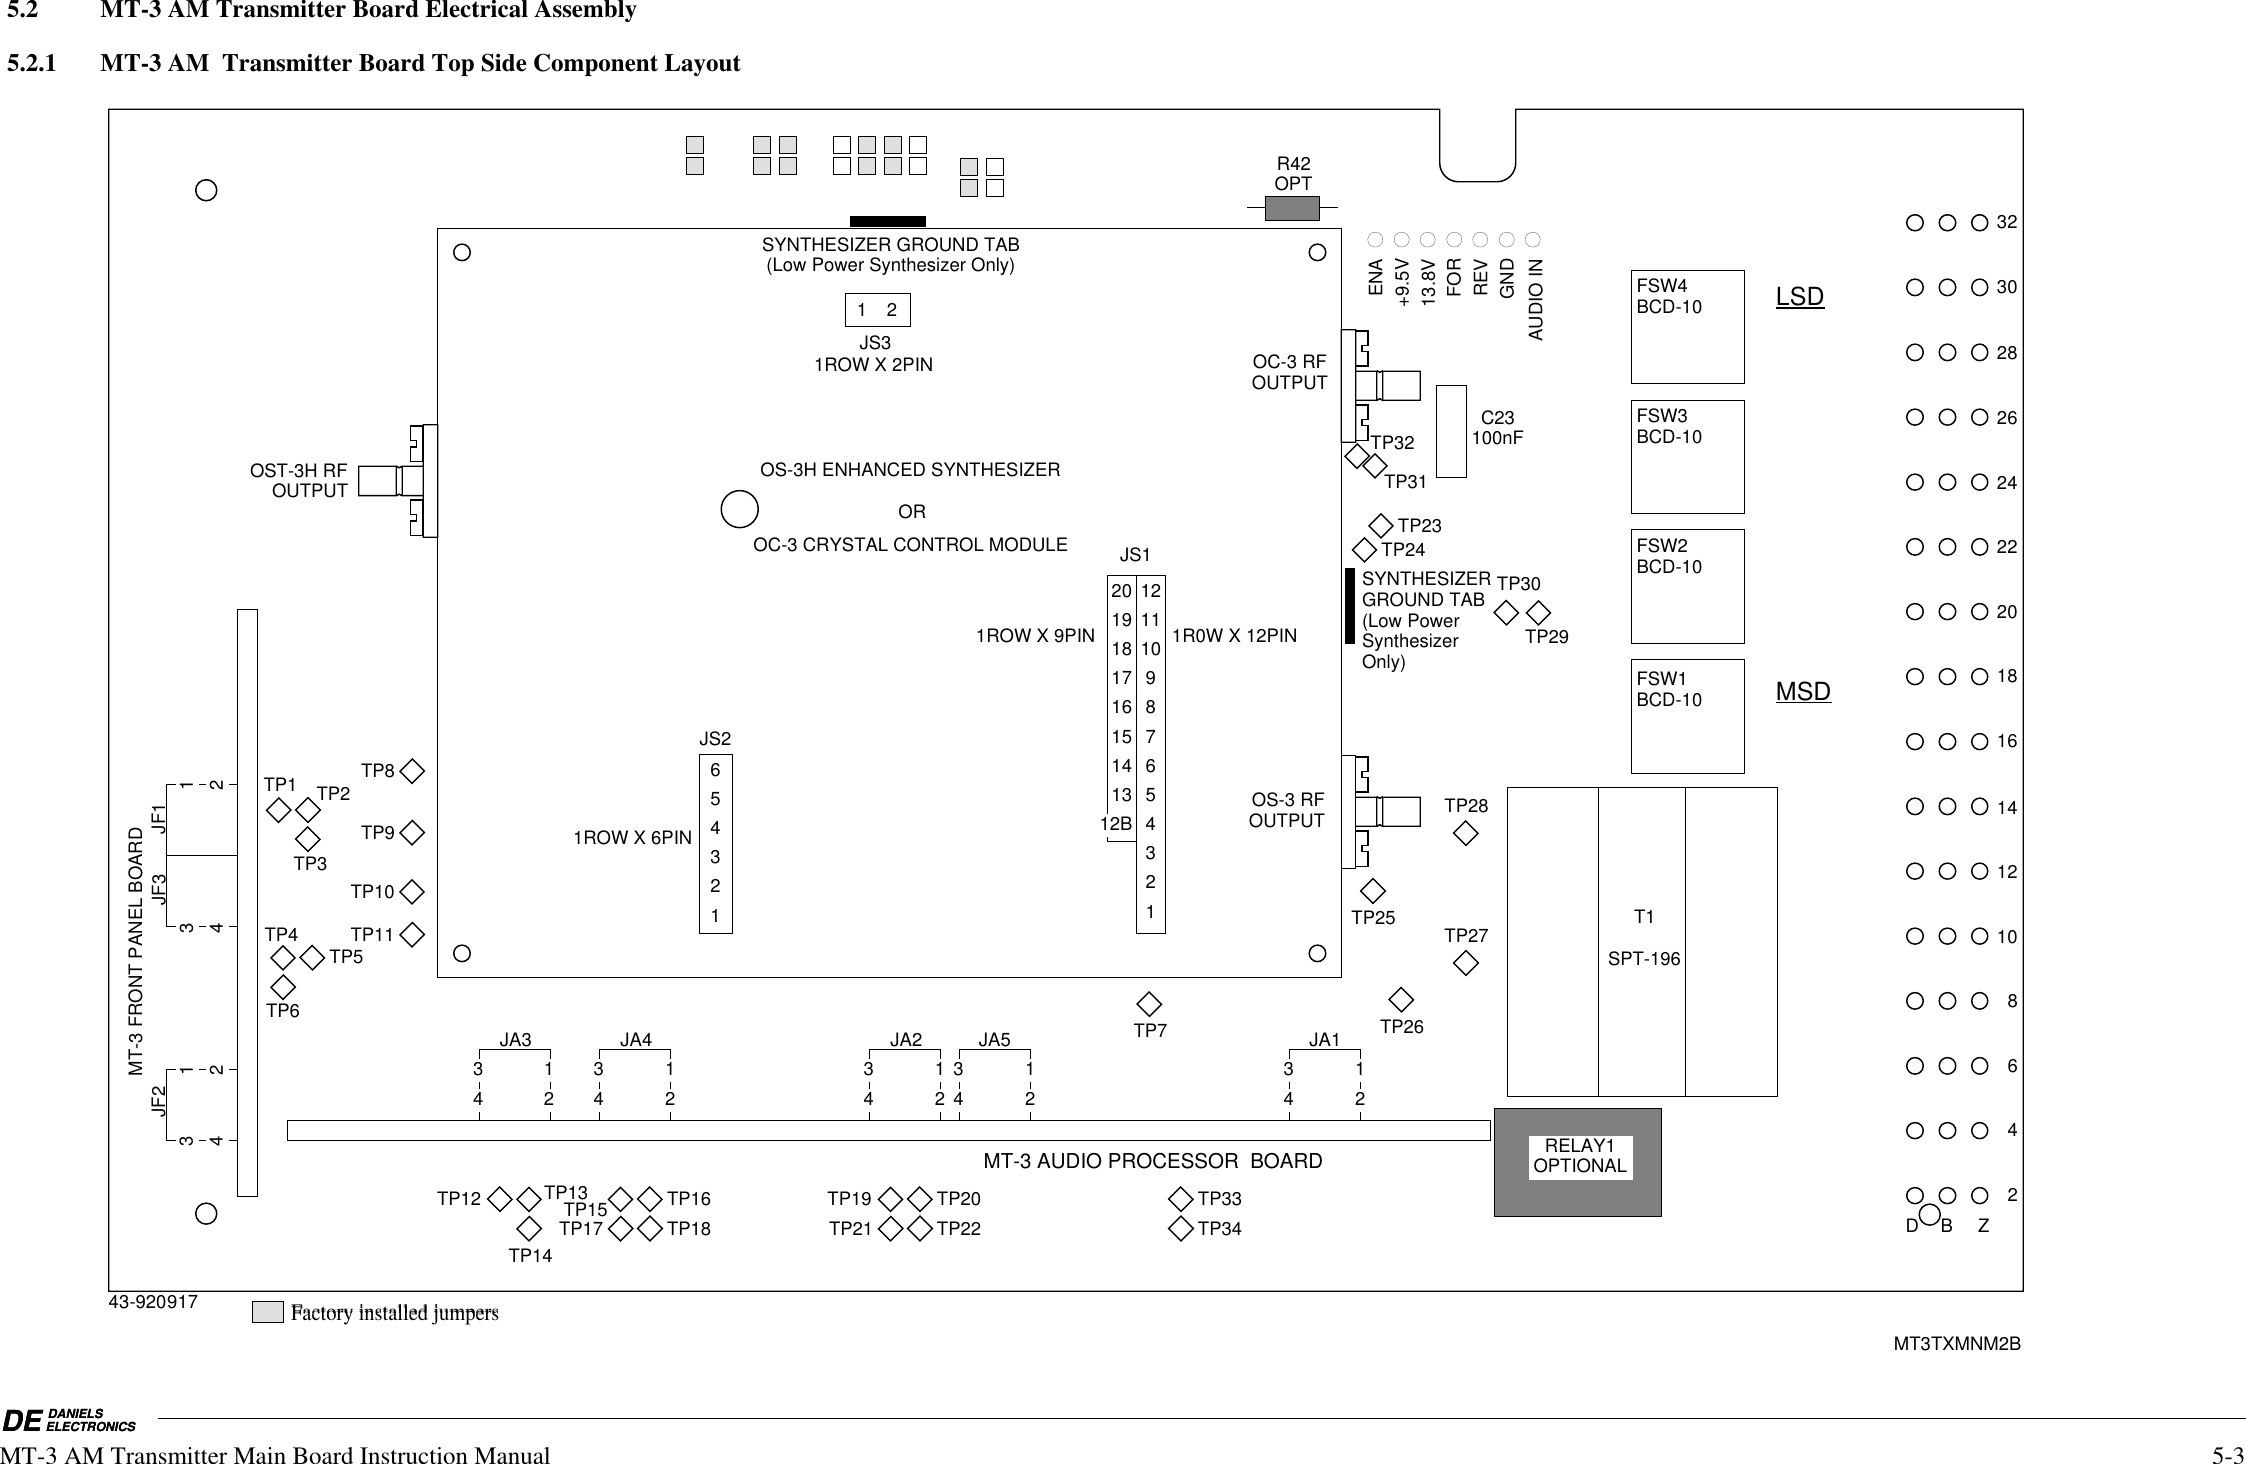 Codan Radio Communications Vt 3a130 S Fsh Transmitter User Manual Mt Am Circuit Diagram Victoria Bc Date May 9 1997ddaniels Electronics Board No 43